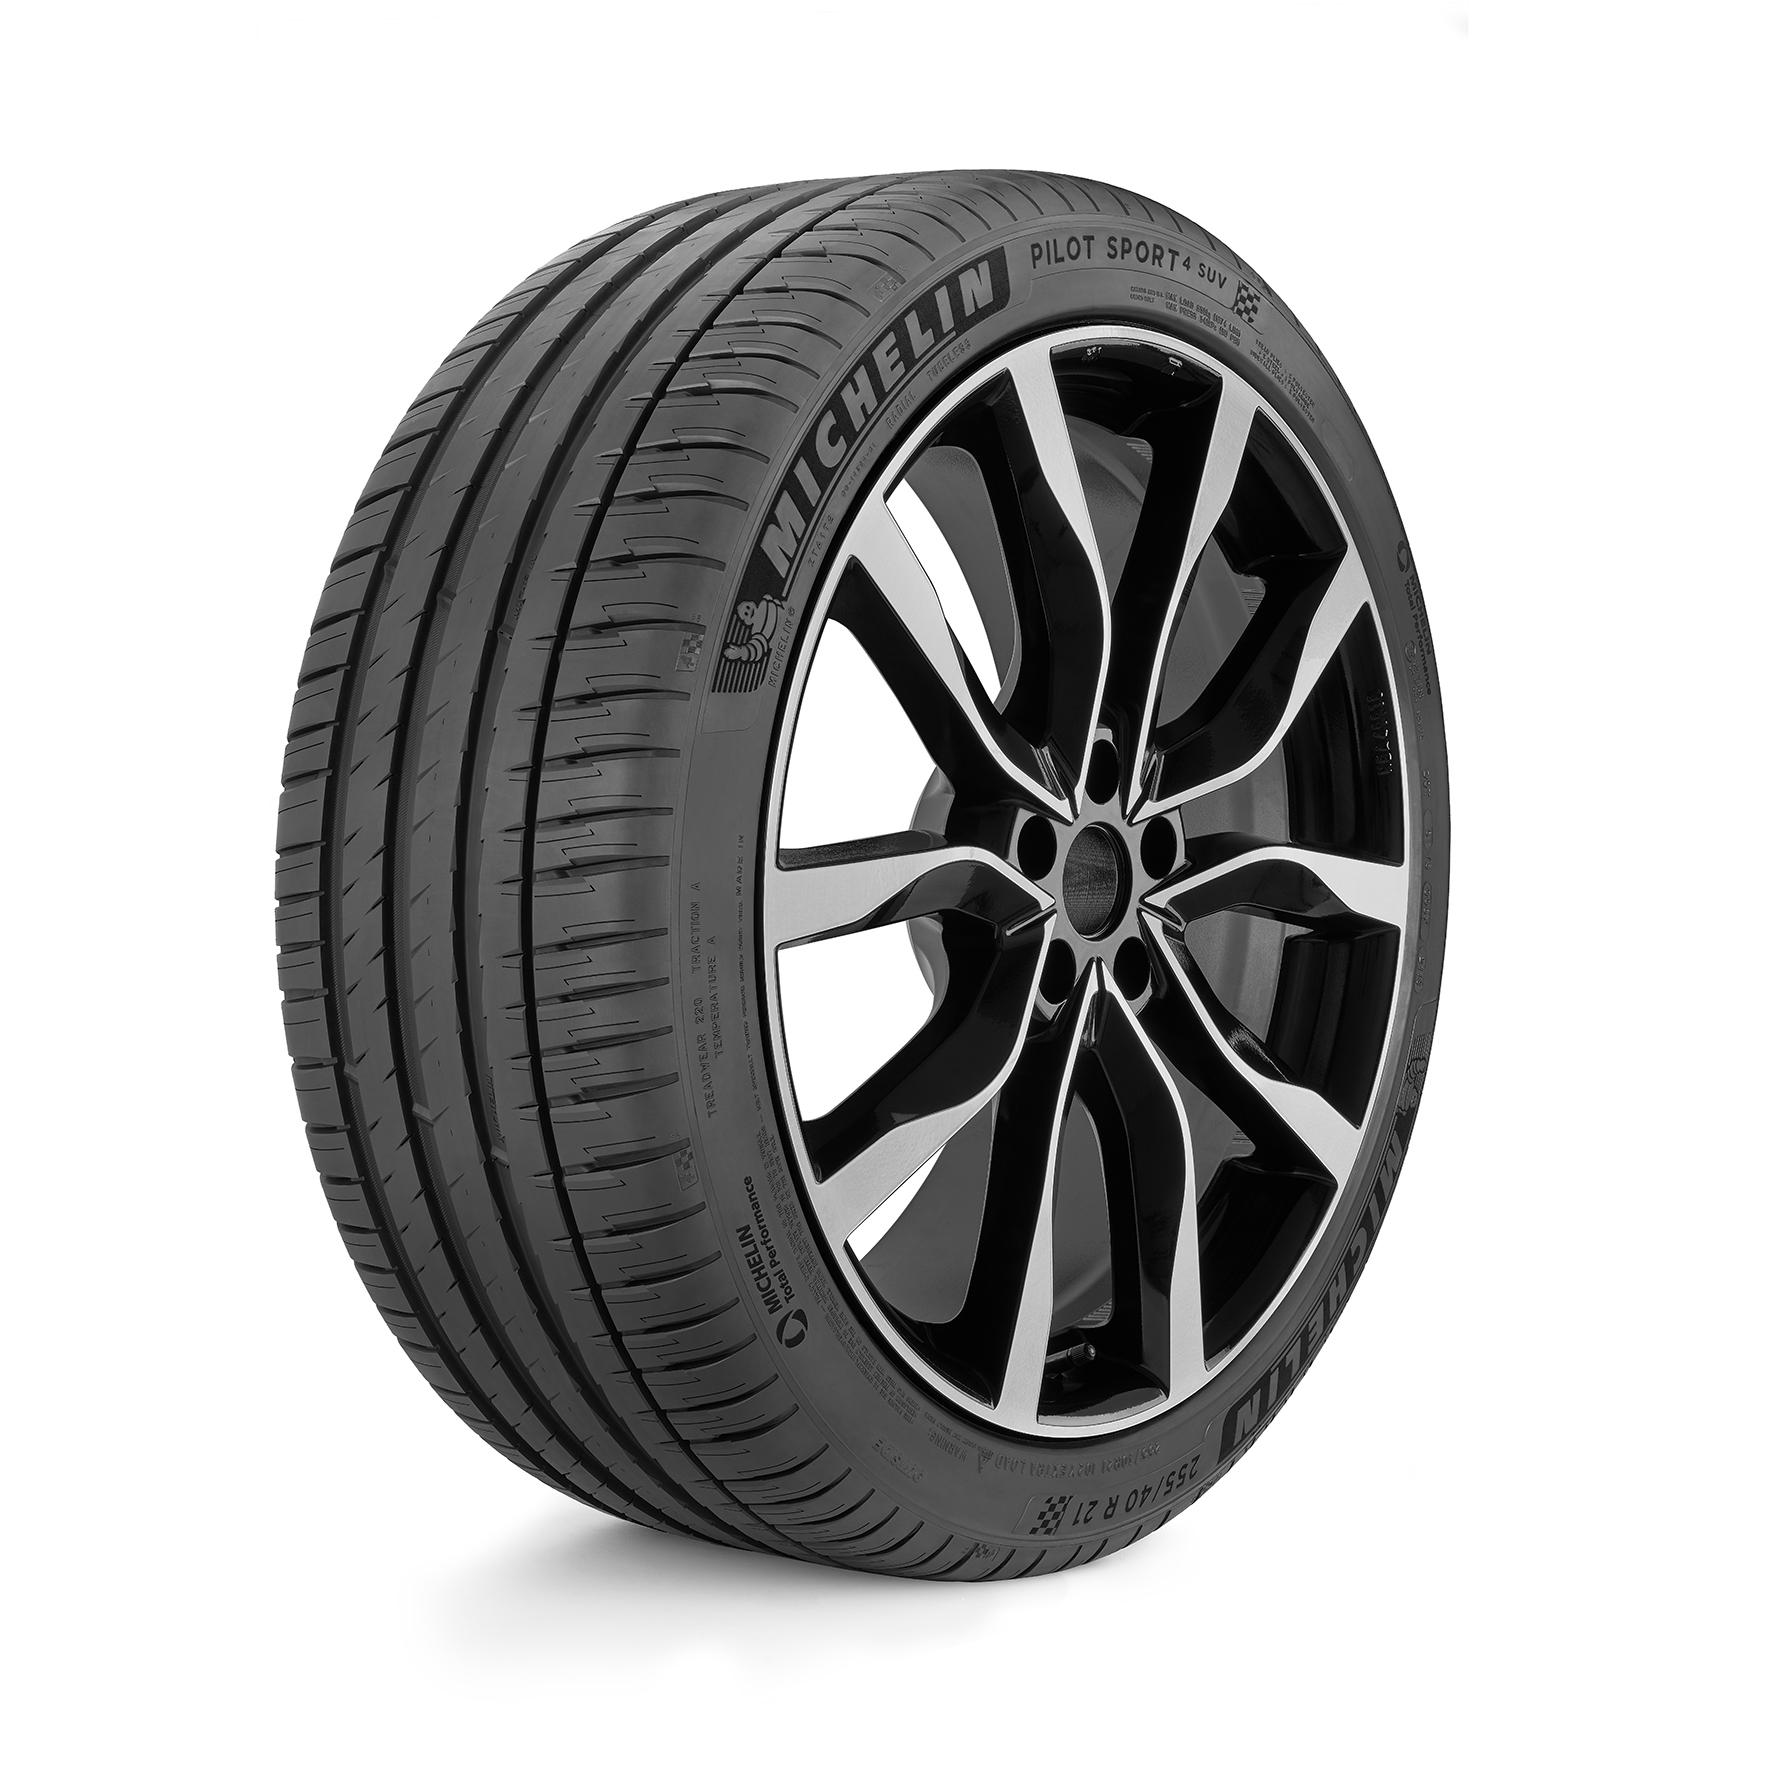 Michelin Pilot Sport >> Michelin Pilot Sport 4 Suv